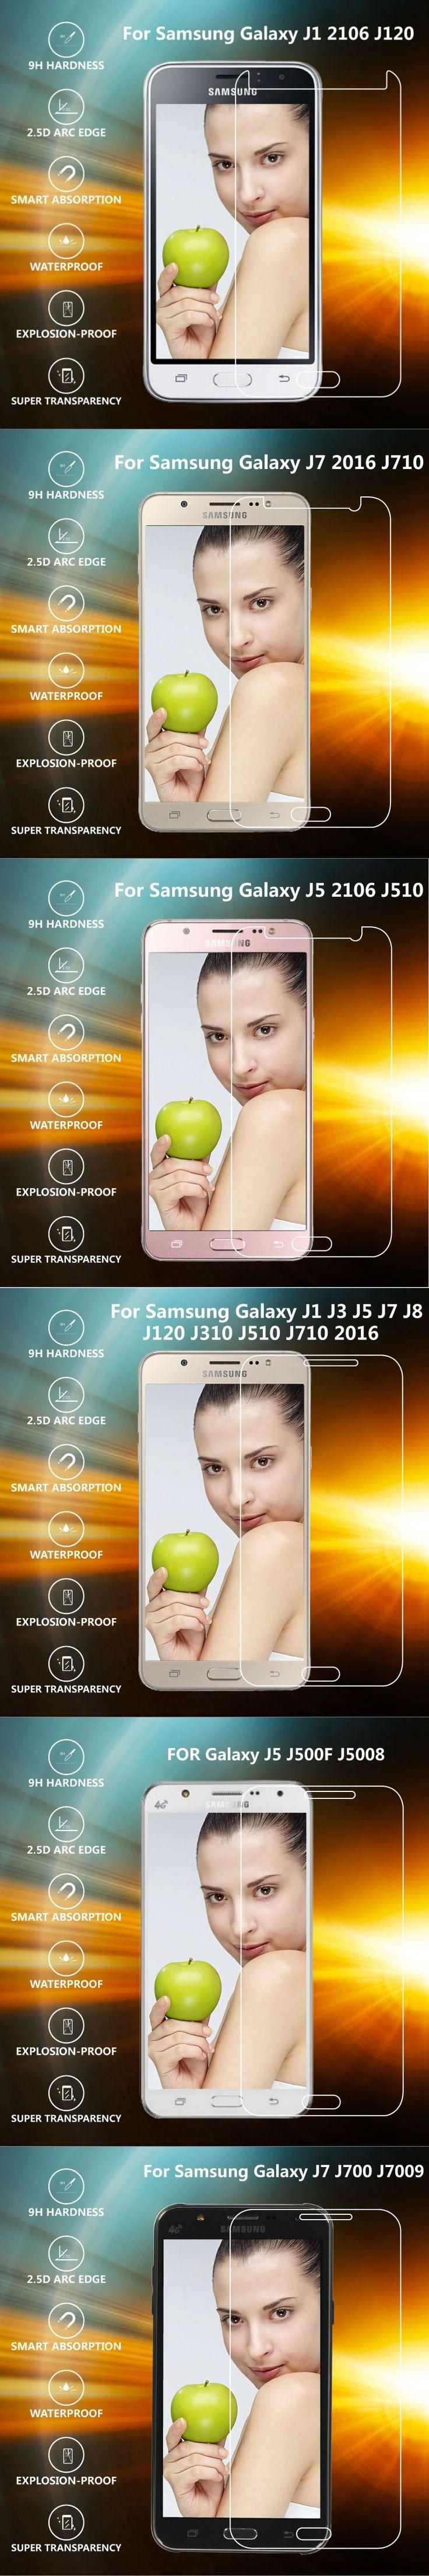 GULYNN ultra thin HD clear 2.5D Tempered Glass For Samsung J1 J3 J5 J7 J120 J310 J510 S7 S6 2016 J2 PRIME Screen Protector Film